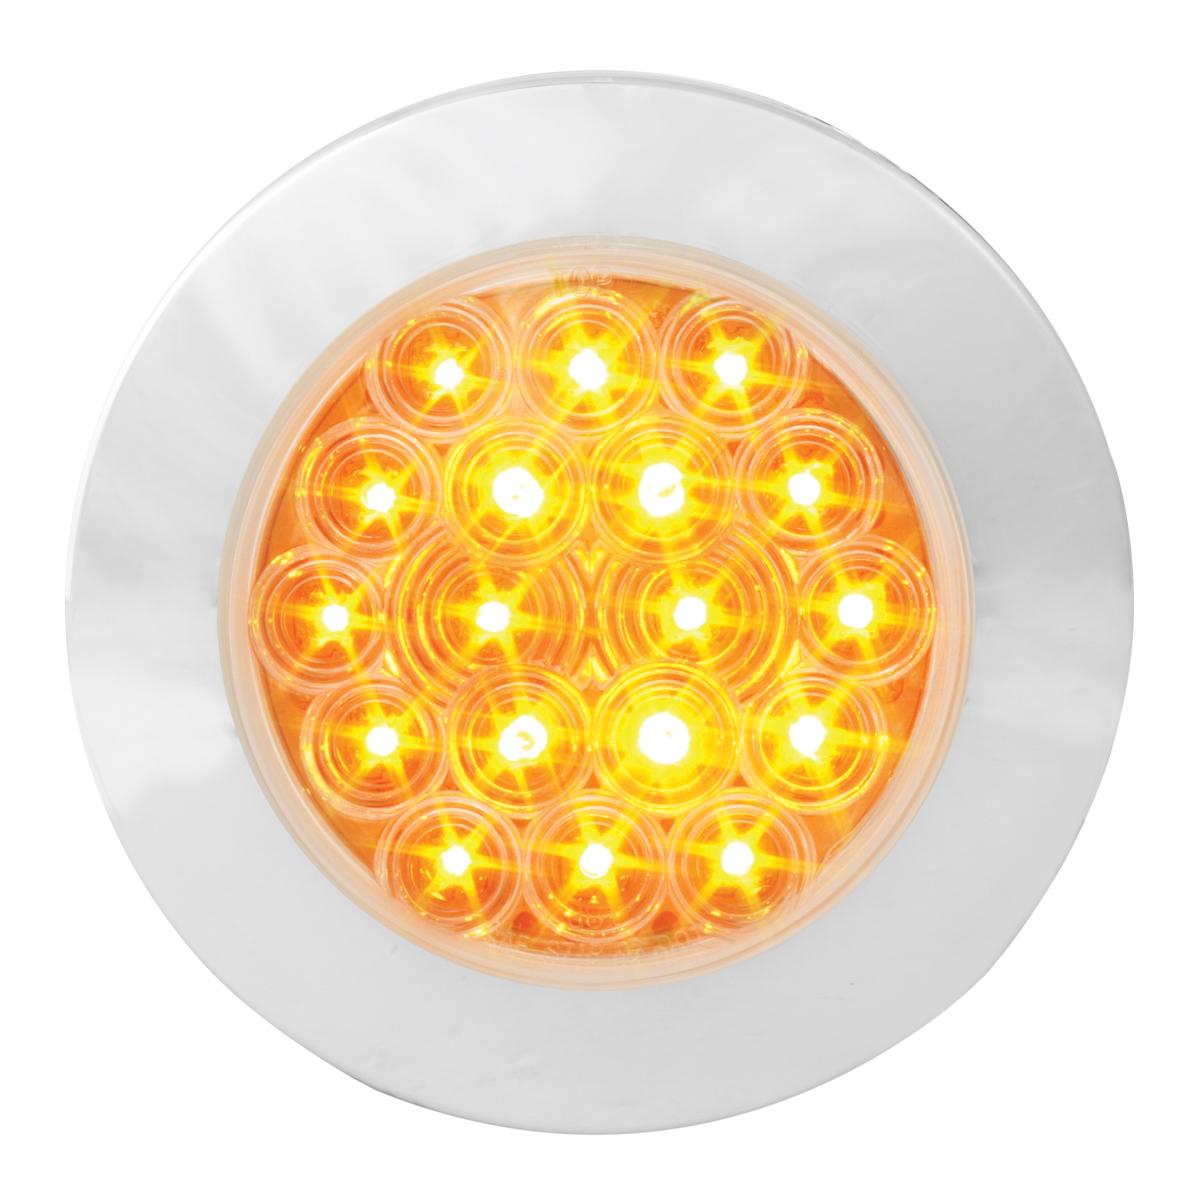 "75901 Amber/Clear 4"" Fleet Flange Mount LED Light with Chrome Twist & Lock Bezel"